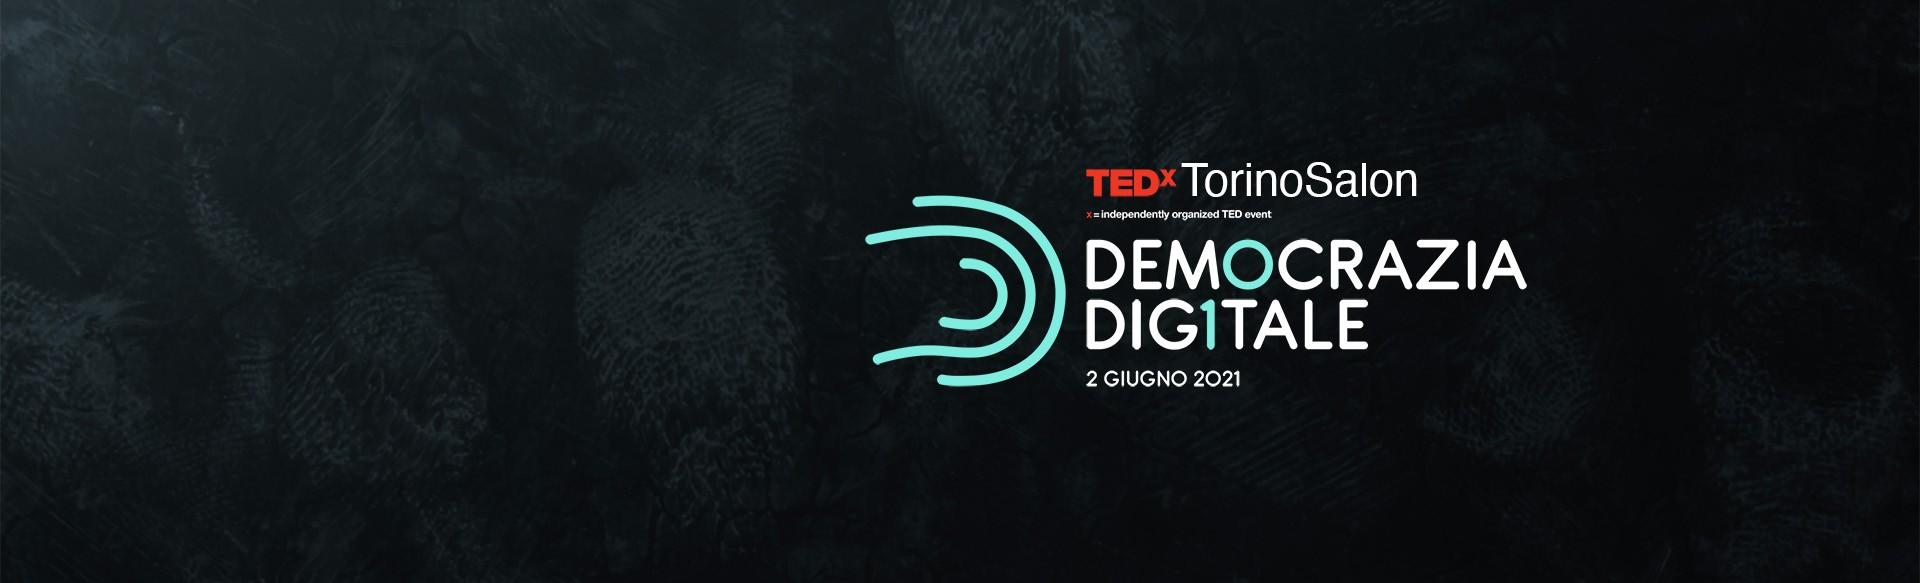 TEDxTorinoSalon Democrazia Digitale